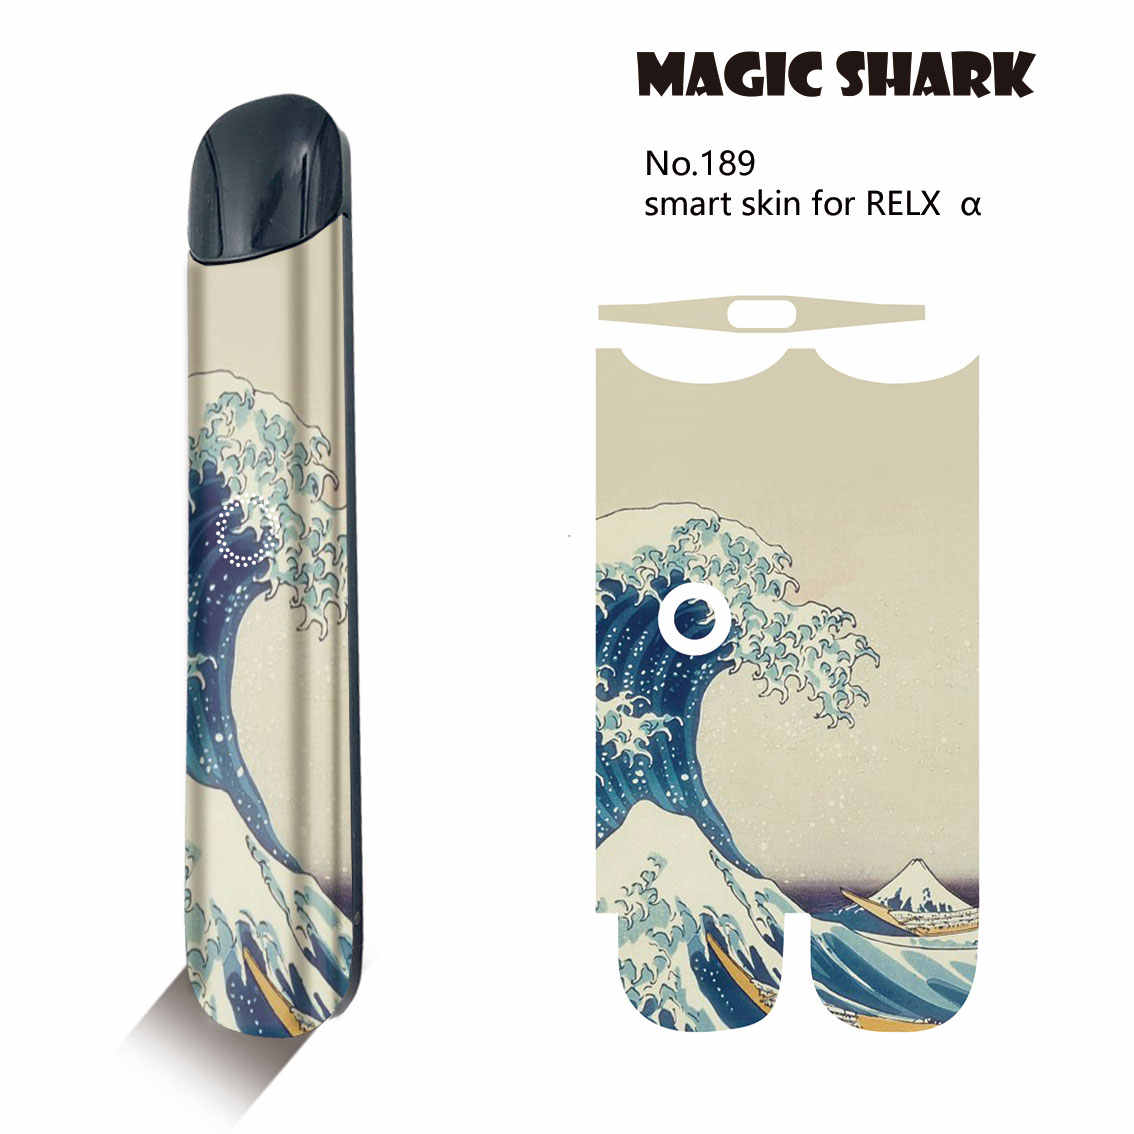 Волшебная Акула Забавный Человек-паук розовая змея Лев ананас Жираф электронная сигарета самоклеящаяся пленка для Relx Alpha